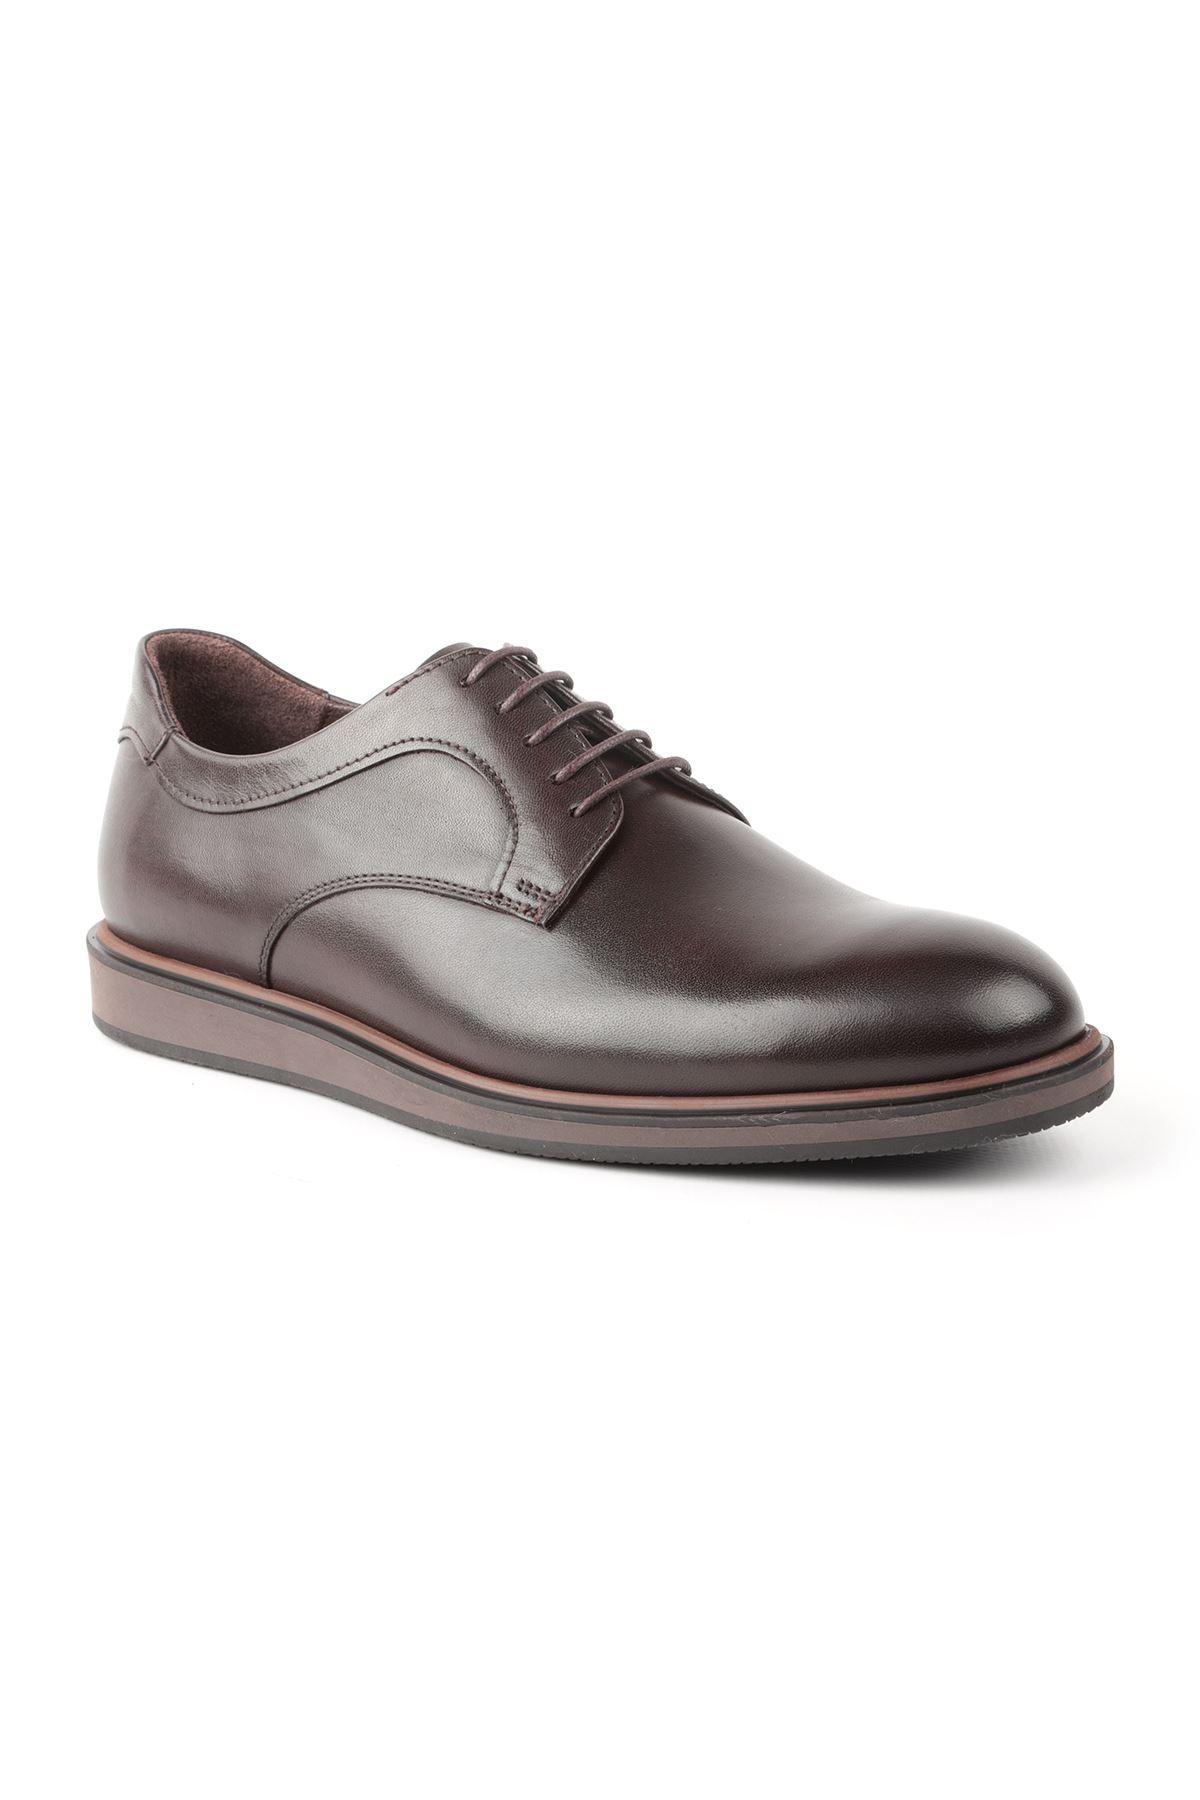 Libero L3653 Brown Classic Men's Shoes